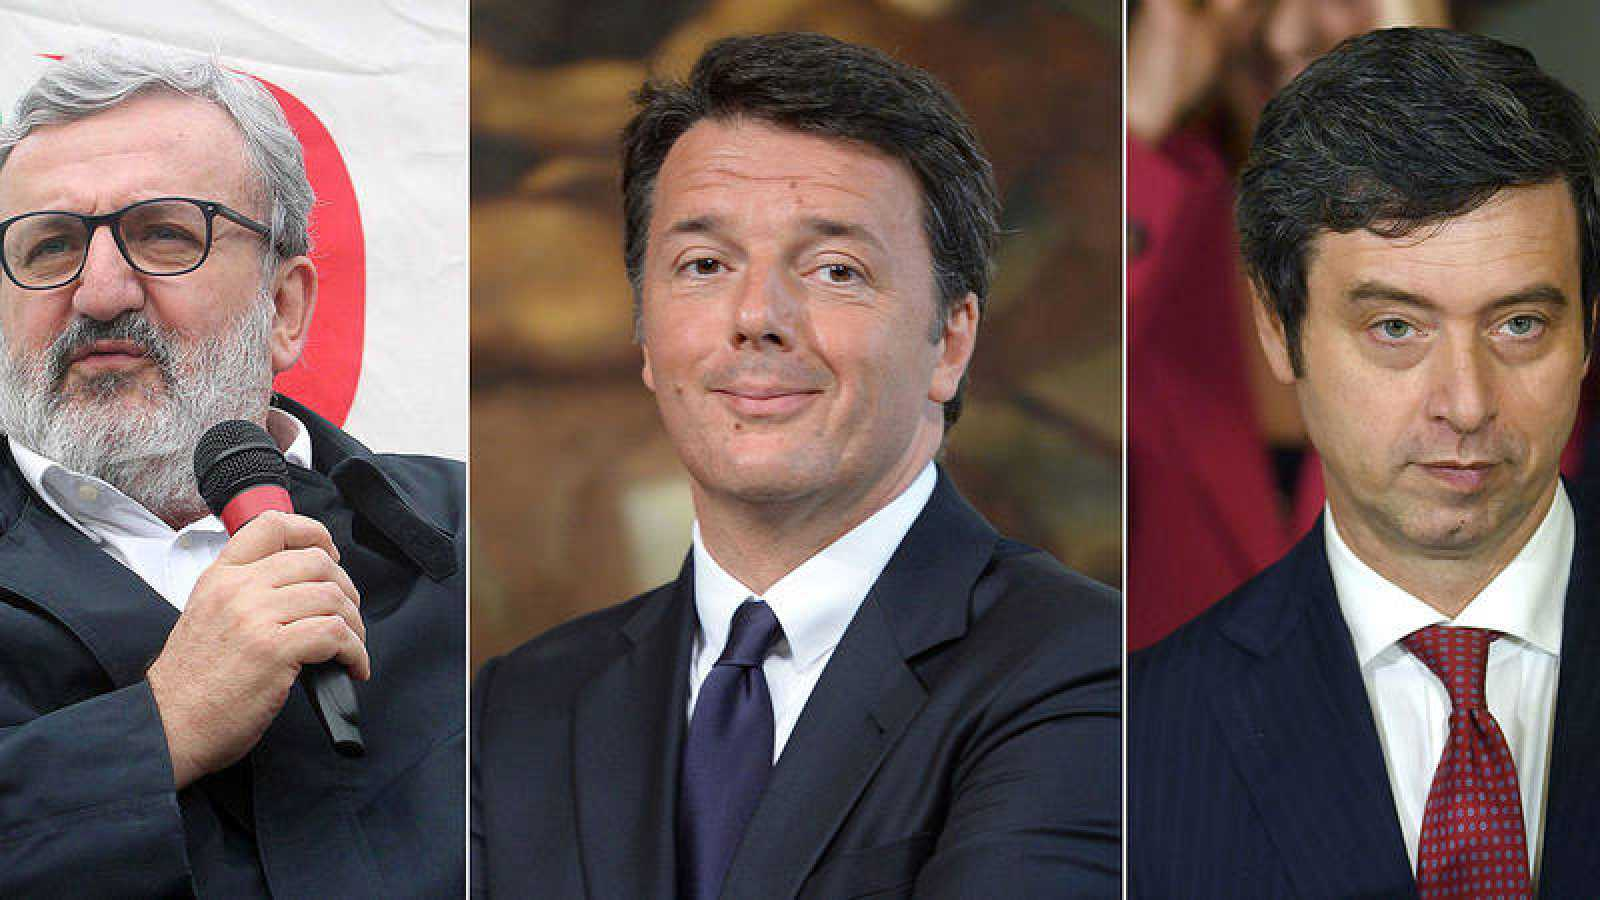 (De izda. a dcha.) Michele Emiliano, Matteo Renzi y Andrea Orlando